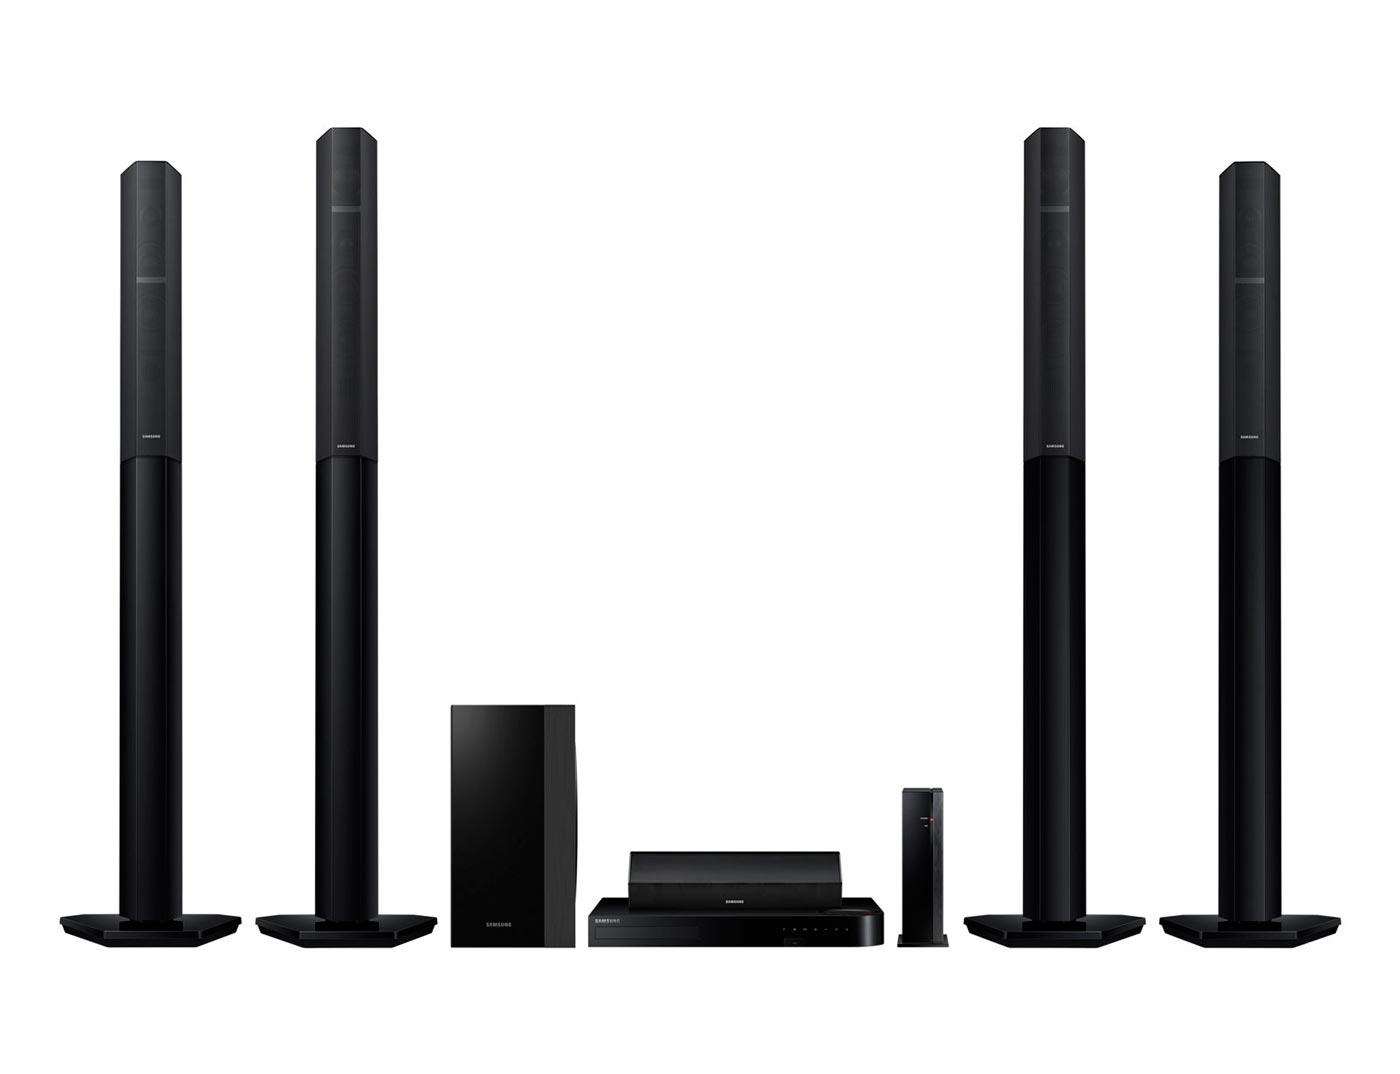 Sistema Home Theater Blu-ray 3D 7.1Ch Samsung HT-H7750WM - Pré-amplificador Valvulado - 1330W - Bluetooth